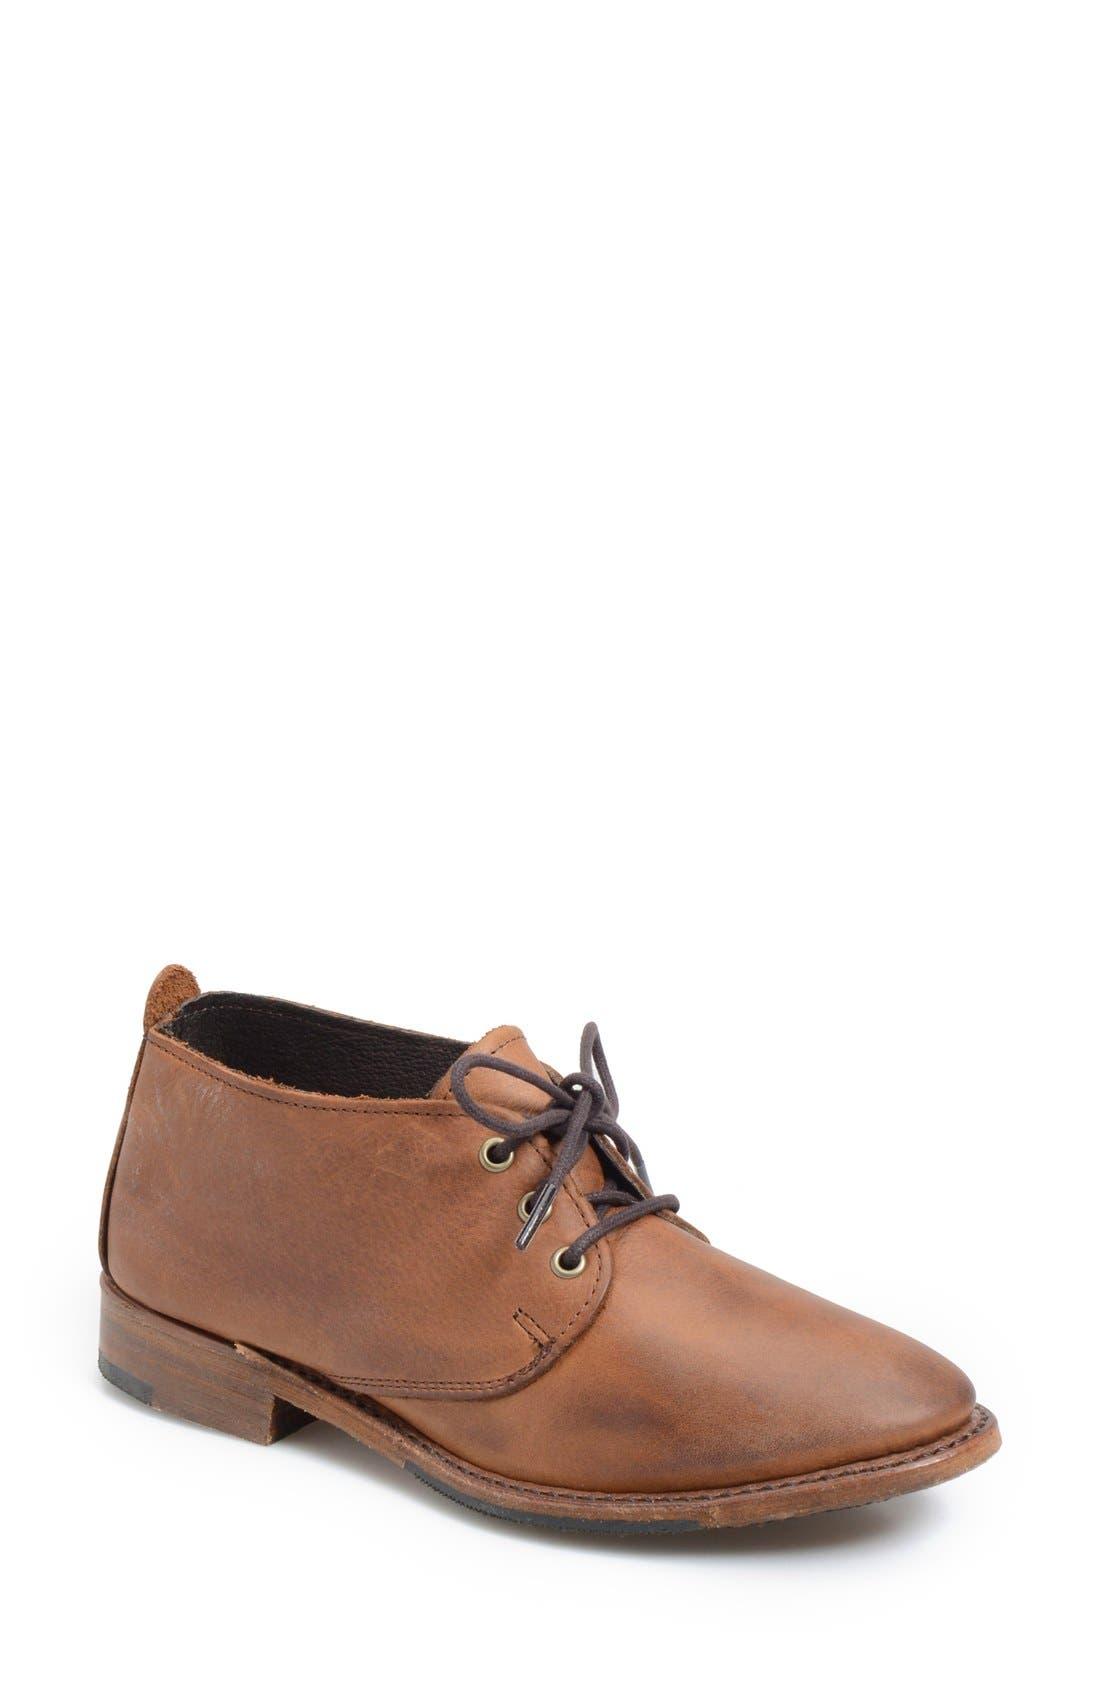 Main Image - Vintage Shoe Company 'Ansley' Chukka Boot (Women)